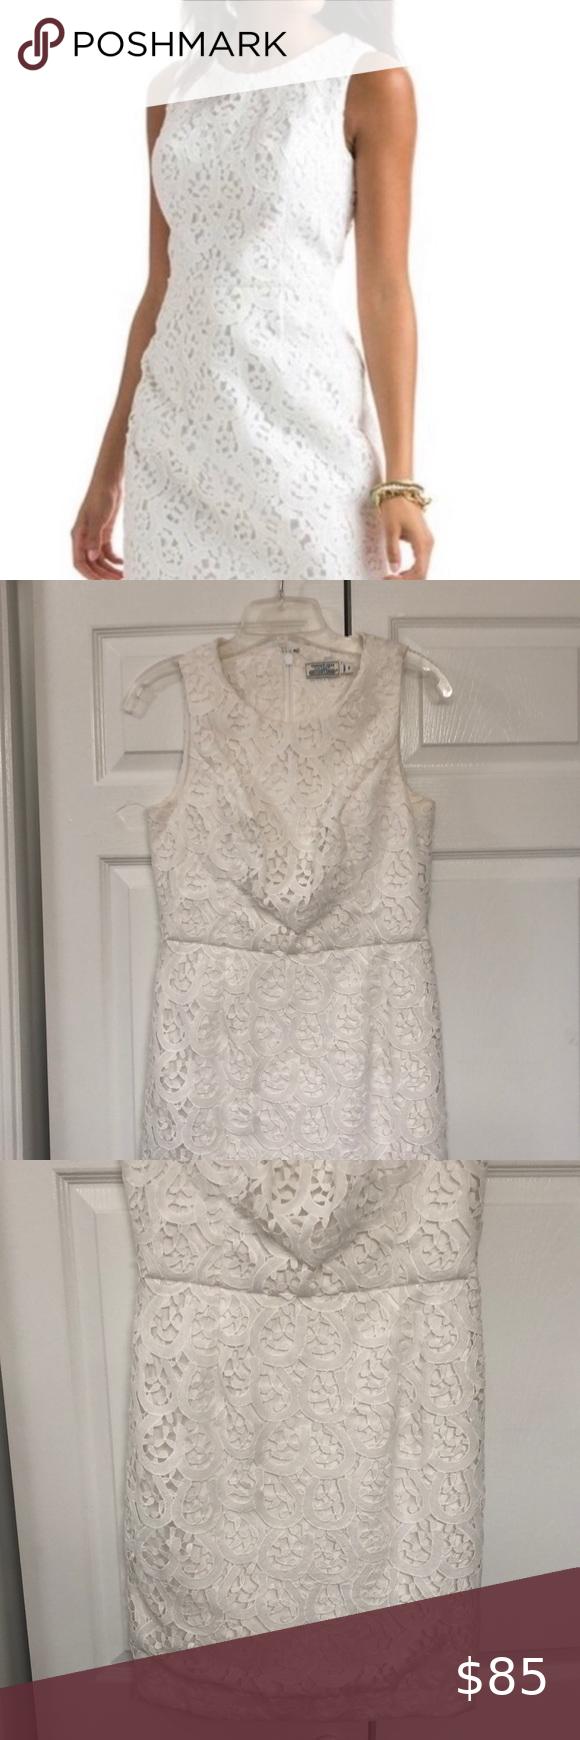 Vineyard Vines White Shift Dress Size 6 In 2020 White Lace Shift Dress Lace Shift Dress White Shift Dresses [ 1740 x 580 Pixel ]